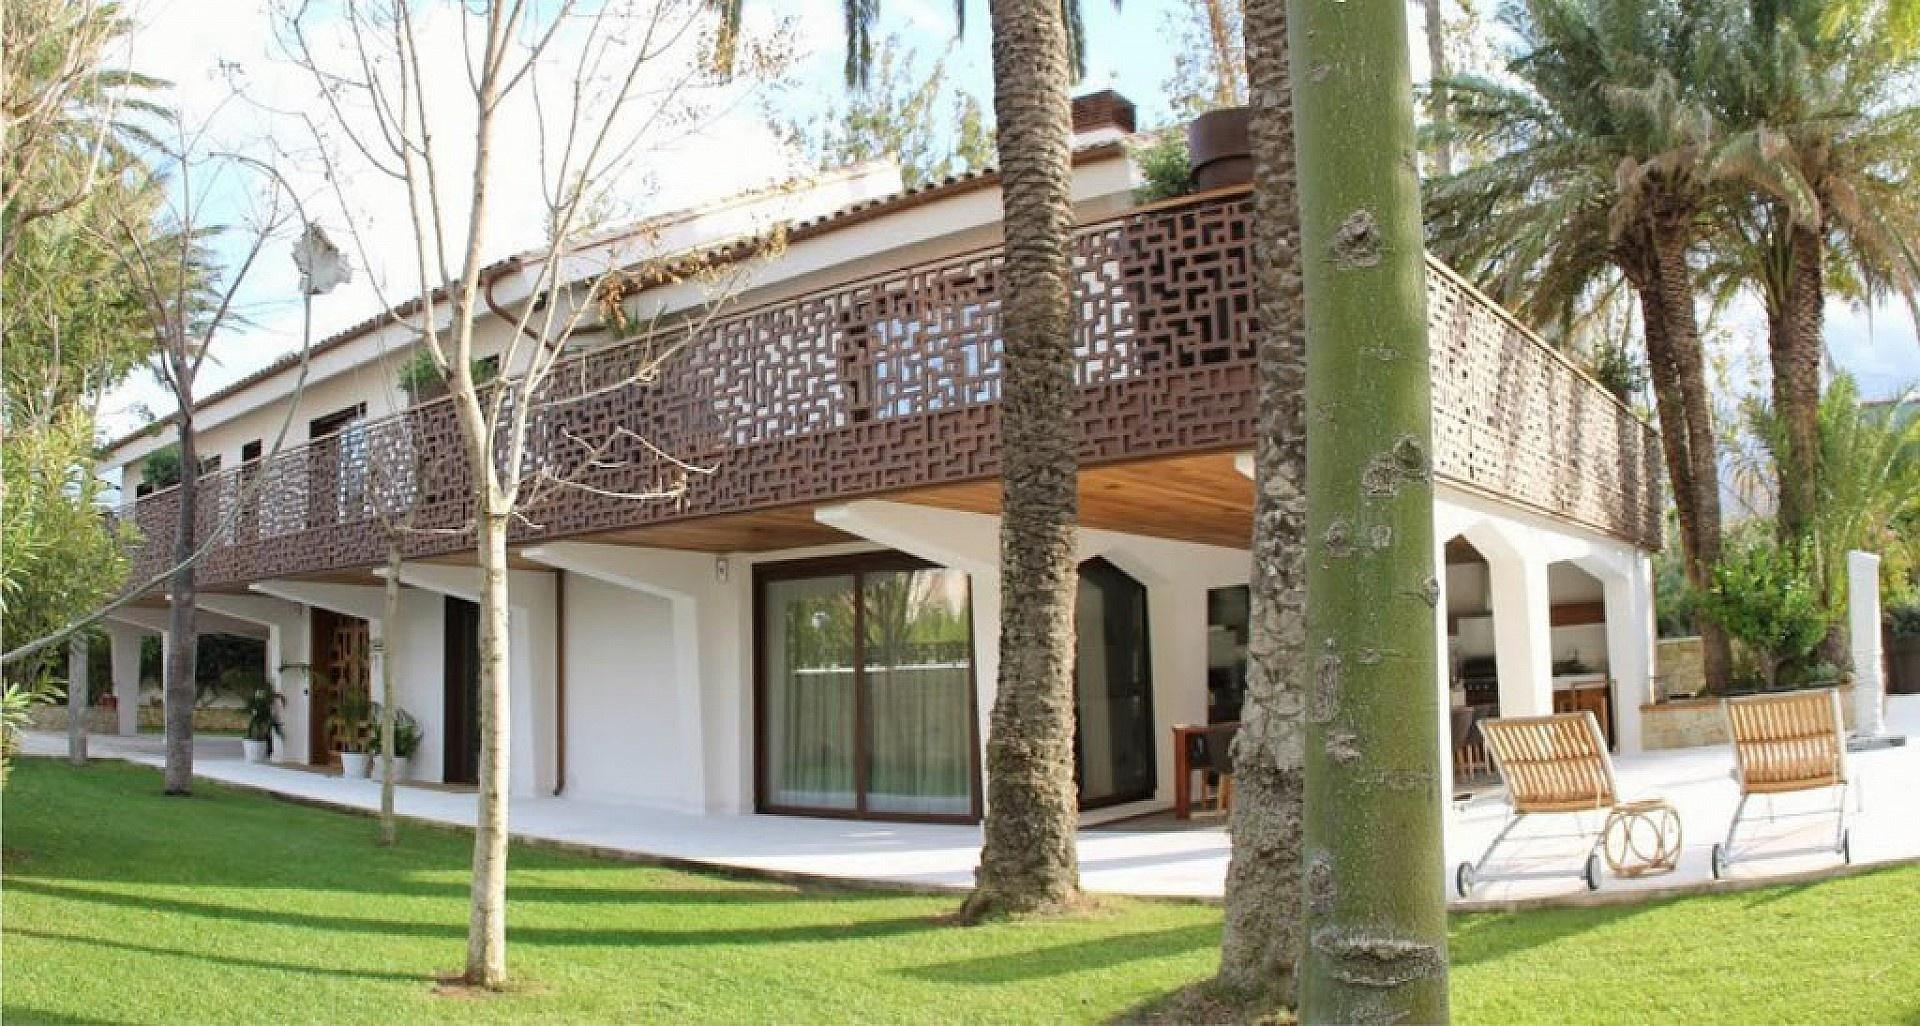 w_denia-huis-tekoop-costa-blanca-spanje-28.jpg